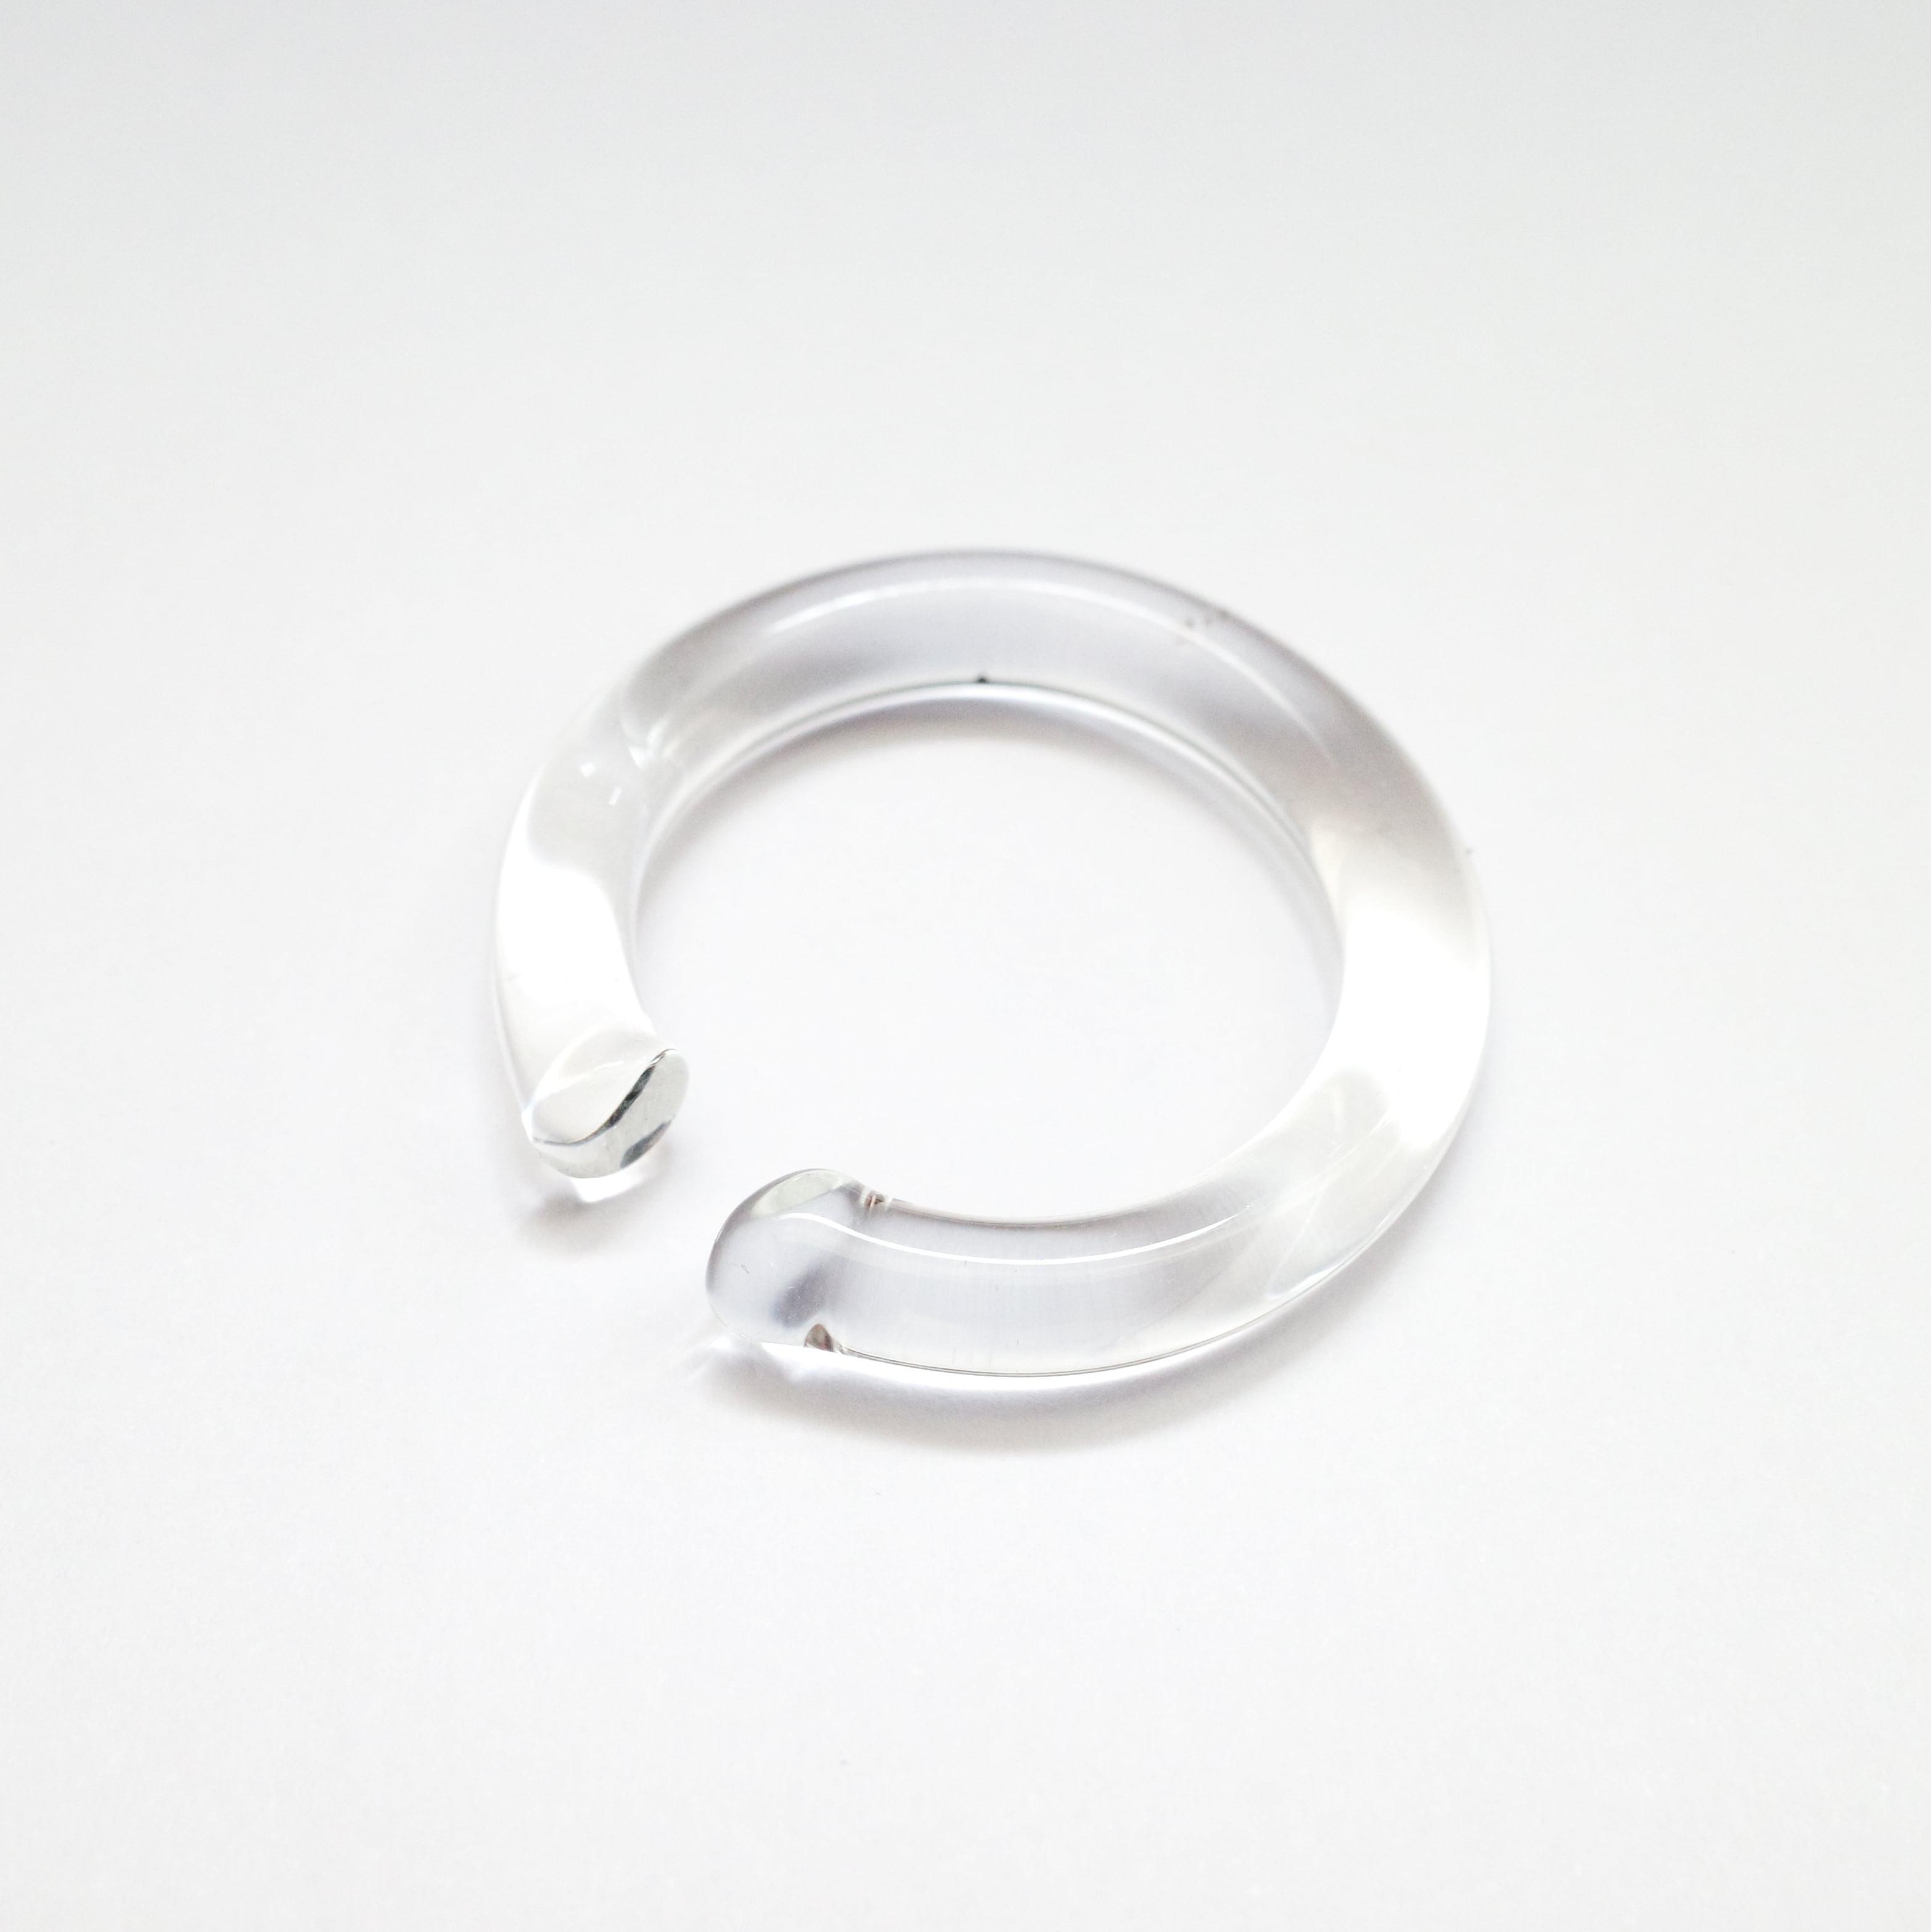 _cthruit シースルーイット ear cuff (S) イヤーカフ 〇(円形) 【Clear】